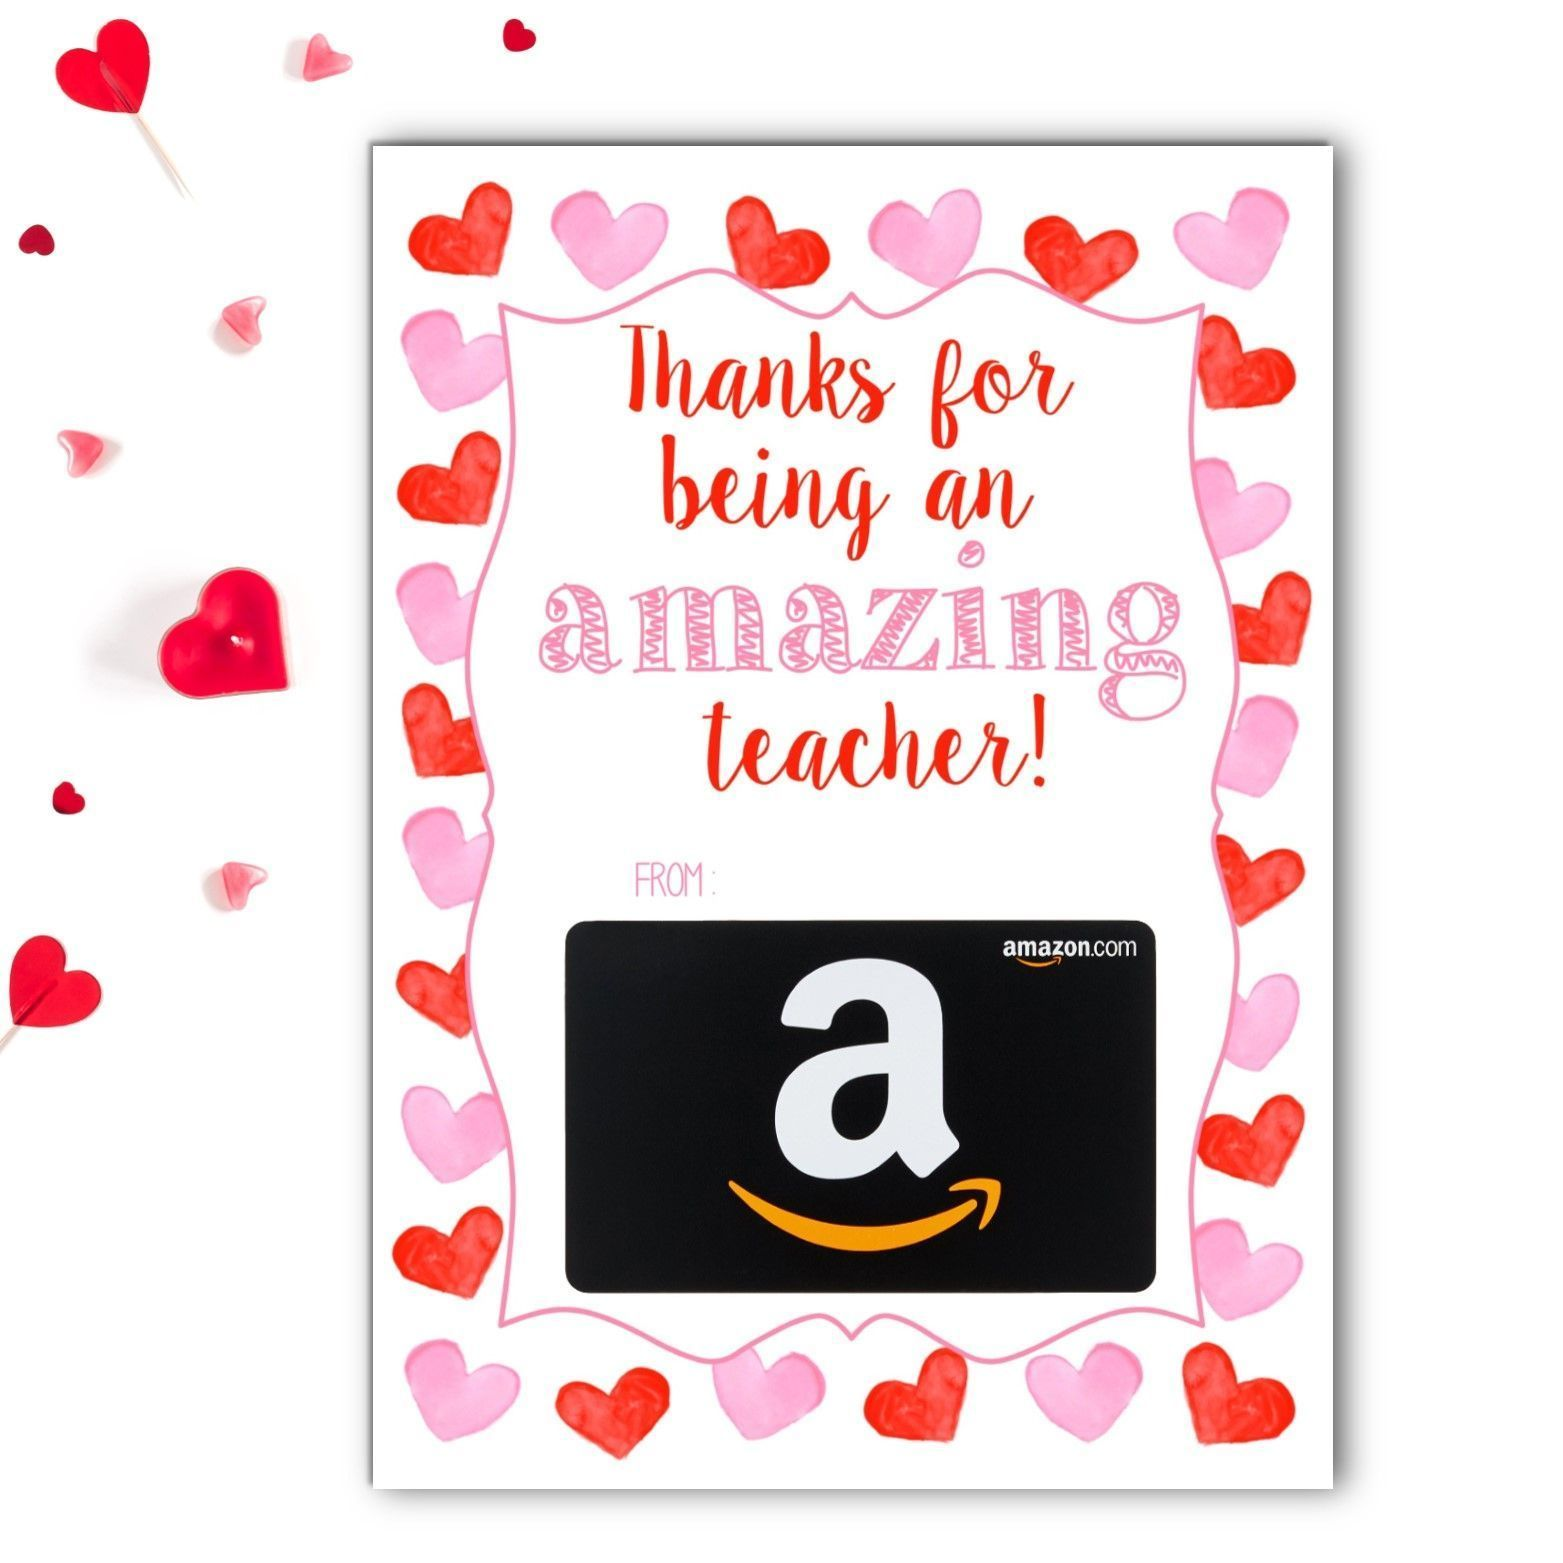 Amazon teacher valentines gift card holder rose paper